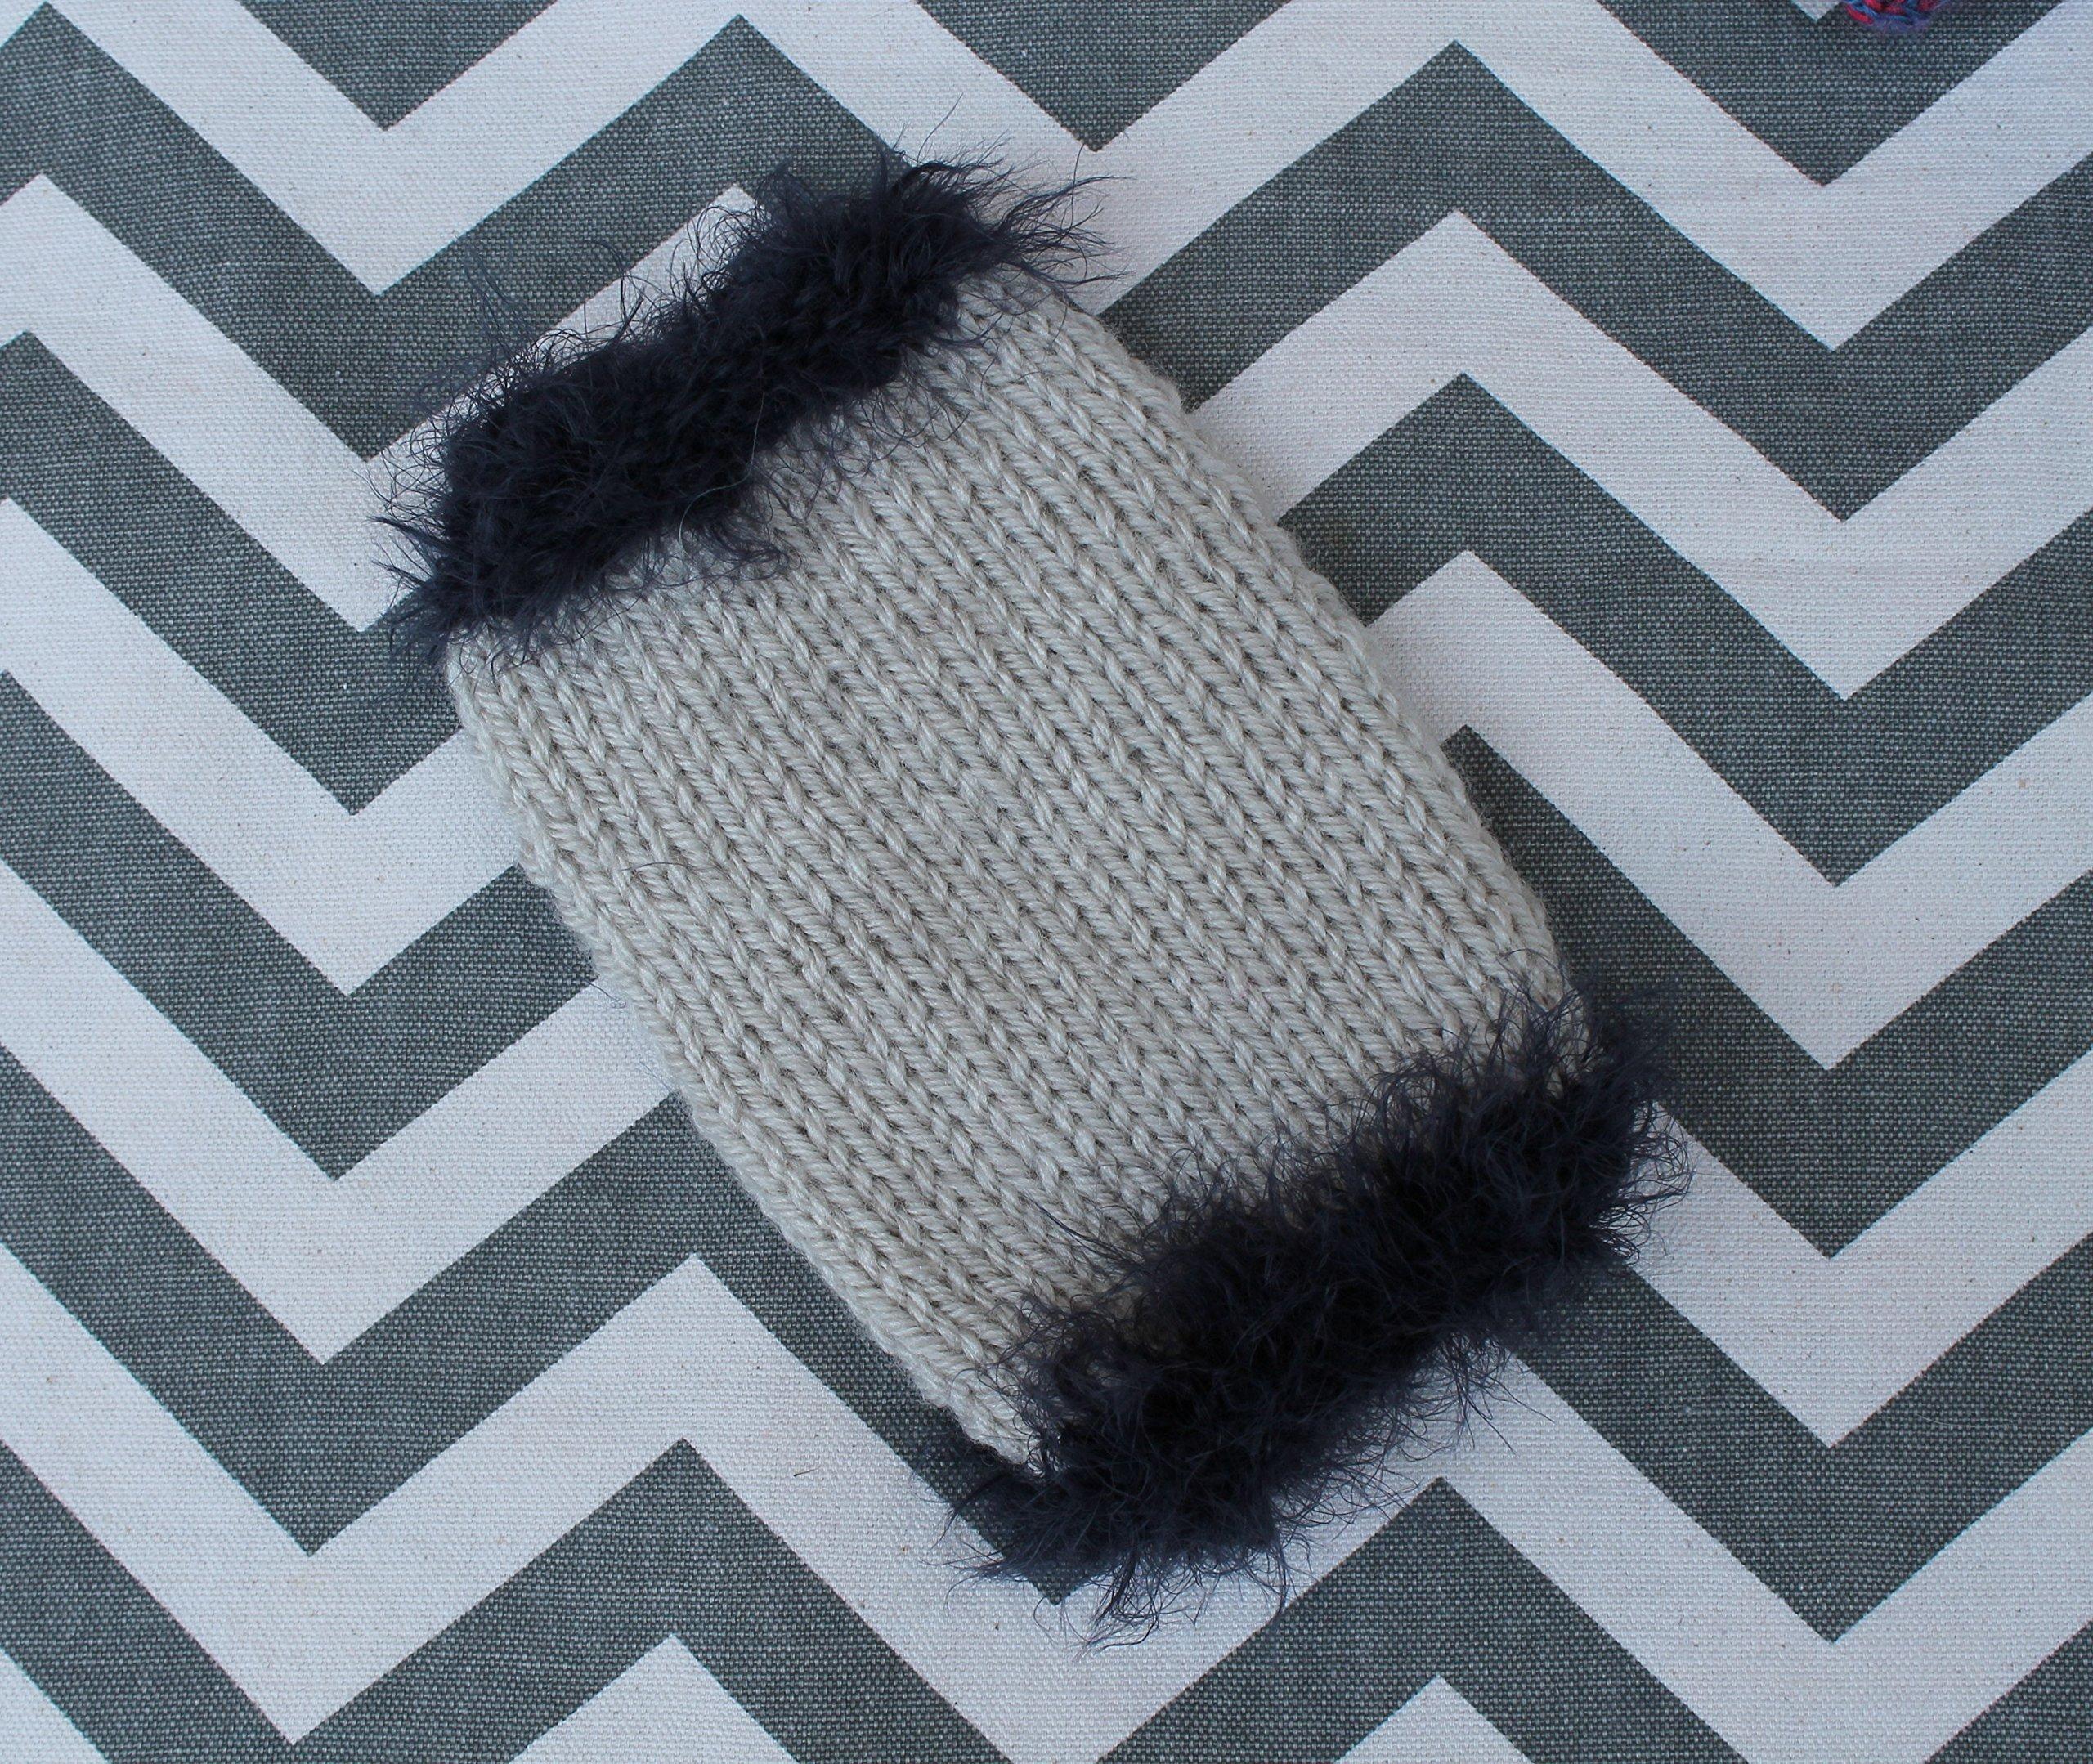 Tiny Dog/Puppy/Kitten Sweater XXXS 1 to 1.5 lbs Rustic Beige w/Deep Purple ''Fuzzy'' Fur for Chihuahua Yorkie Maltese Teacup Pomeranian Puppy